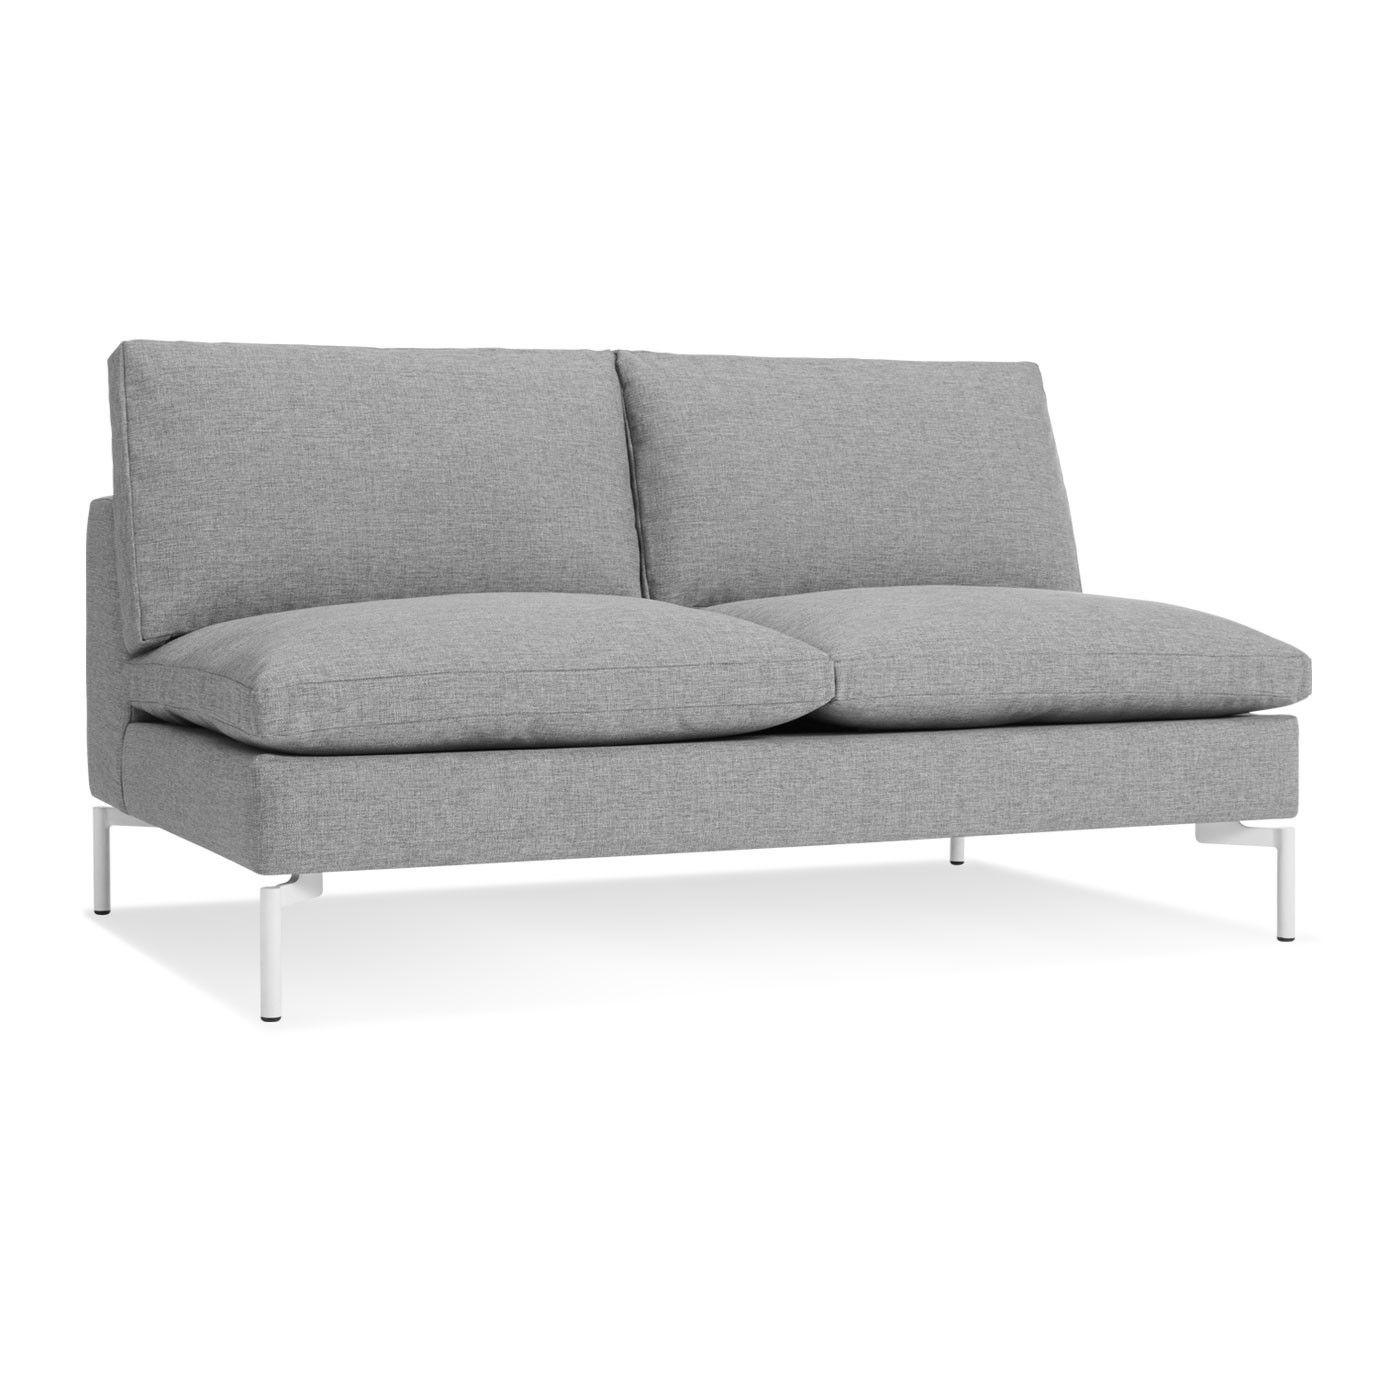 "New Standard 60"" Armless Sofa Love seat, Armless sofa"